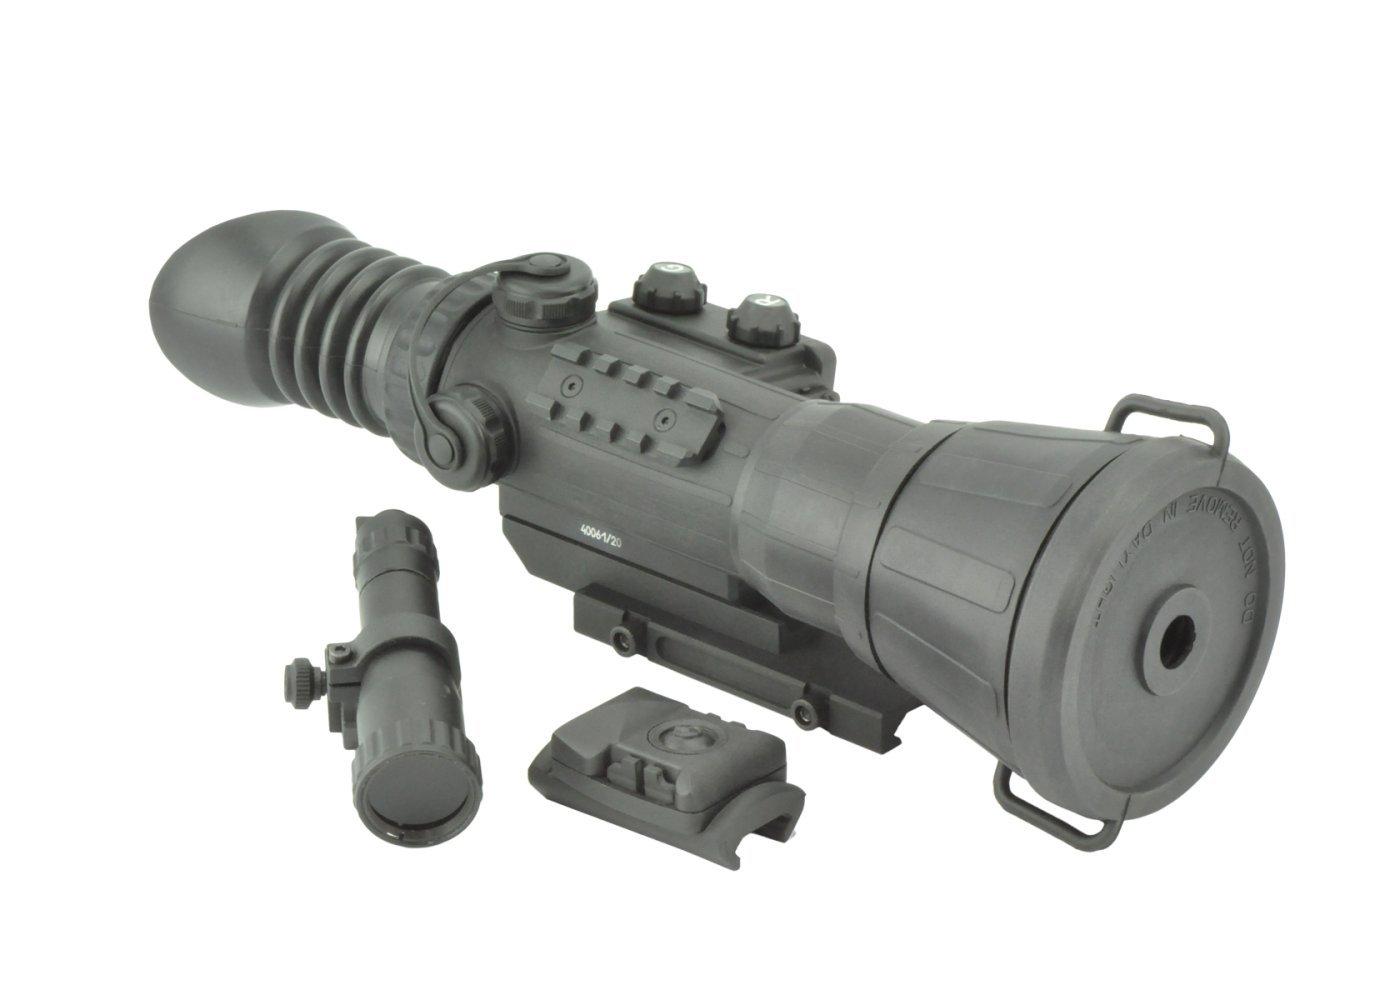 Armasight Vulcan 6X 3P MG - Professional 6x Night Vision Rifle Scope Gen 3; High-Performance Thin-Filmed Auto-Gated IIT with Manual Gain and IR850-XLR Extra Long-Range Infrared Illuminator